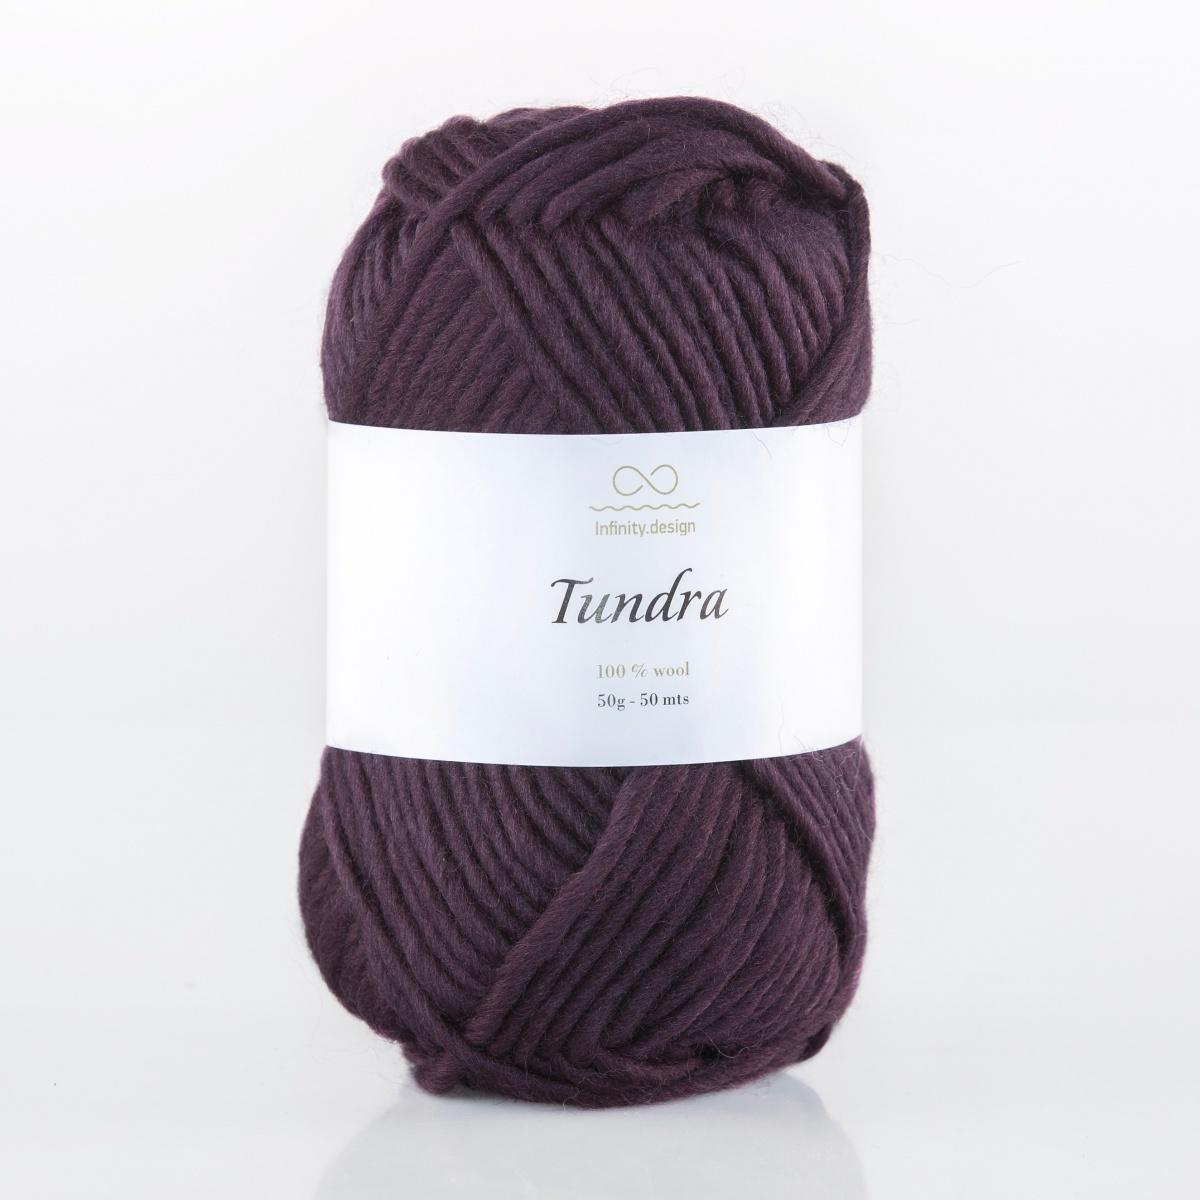 Пряжа Infinity Tundra 5072 темно-фиолетовый